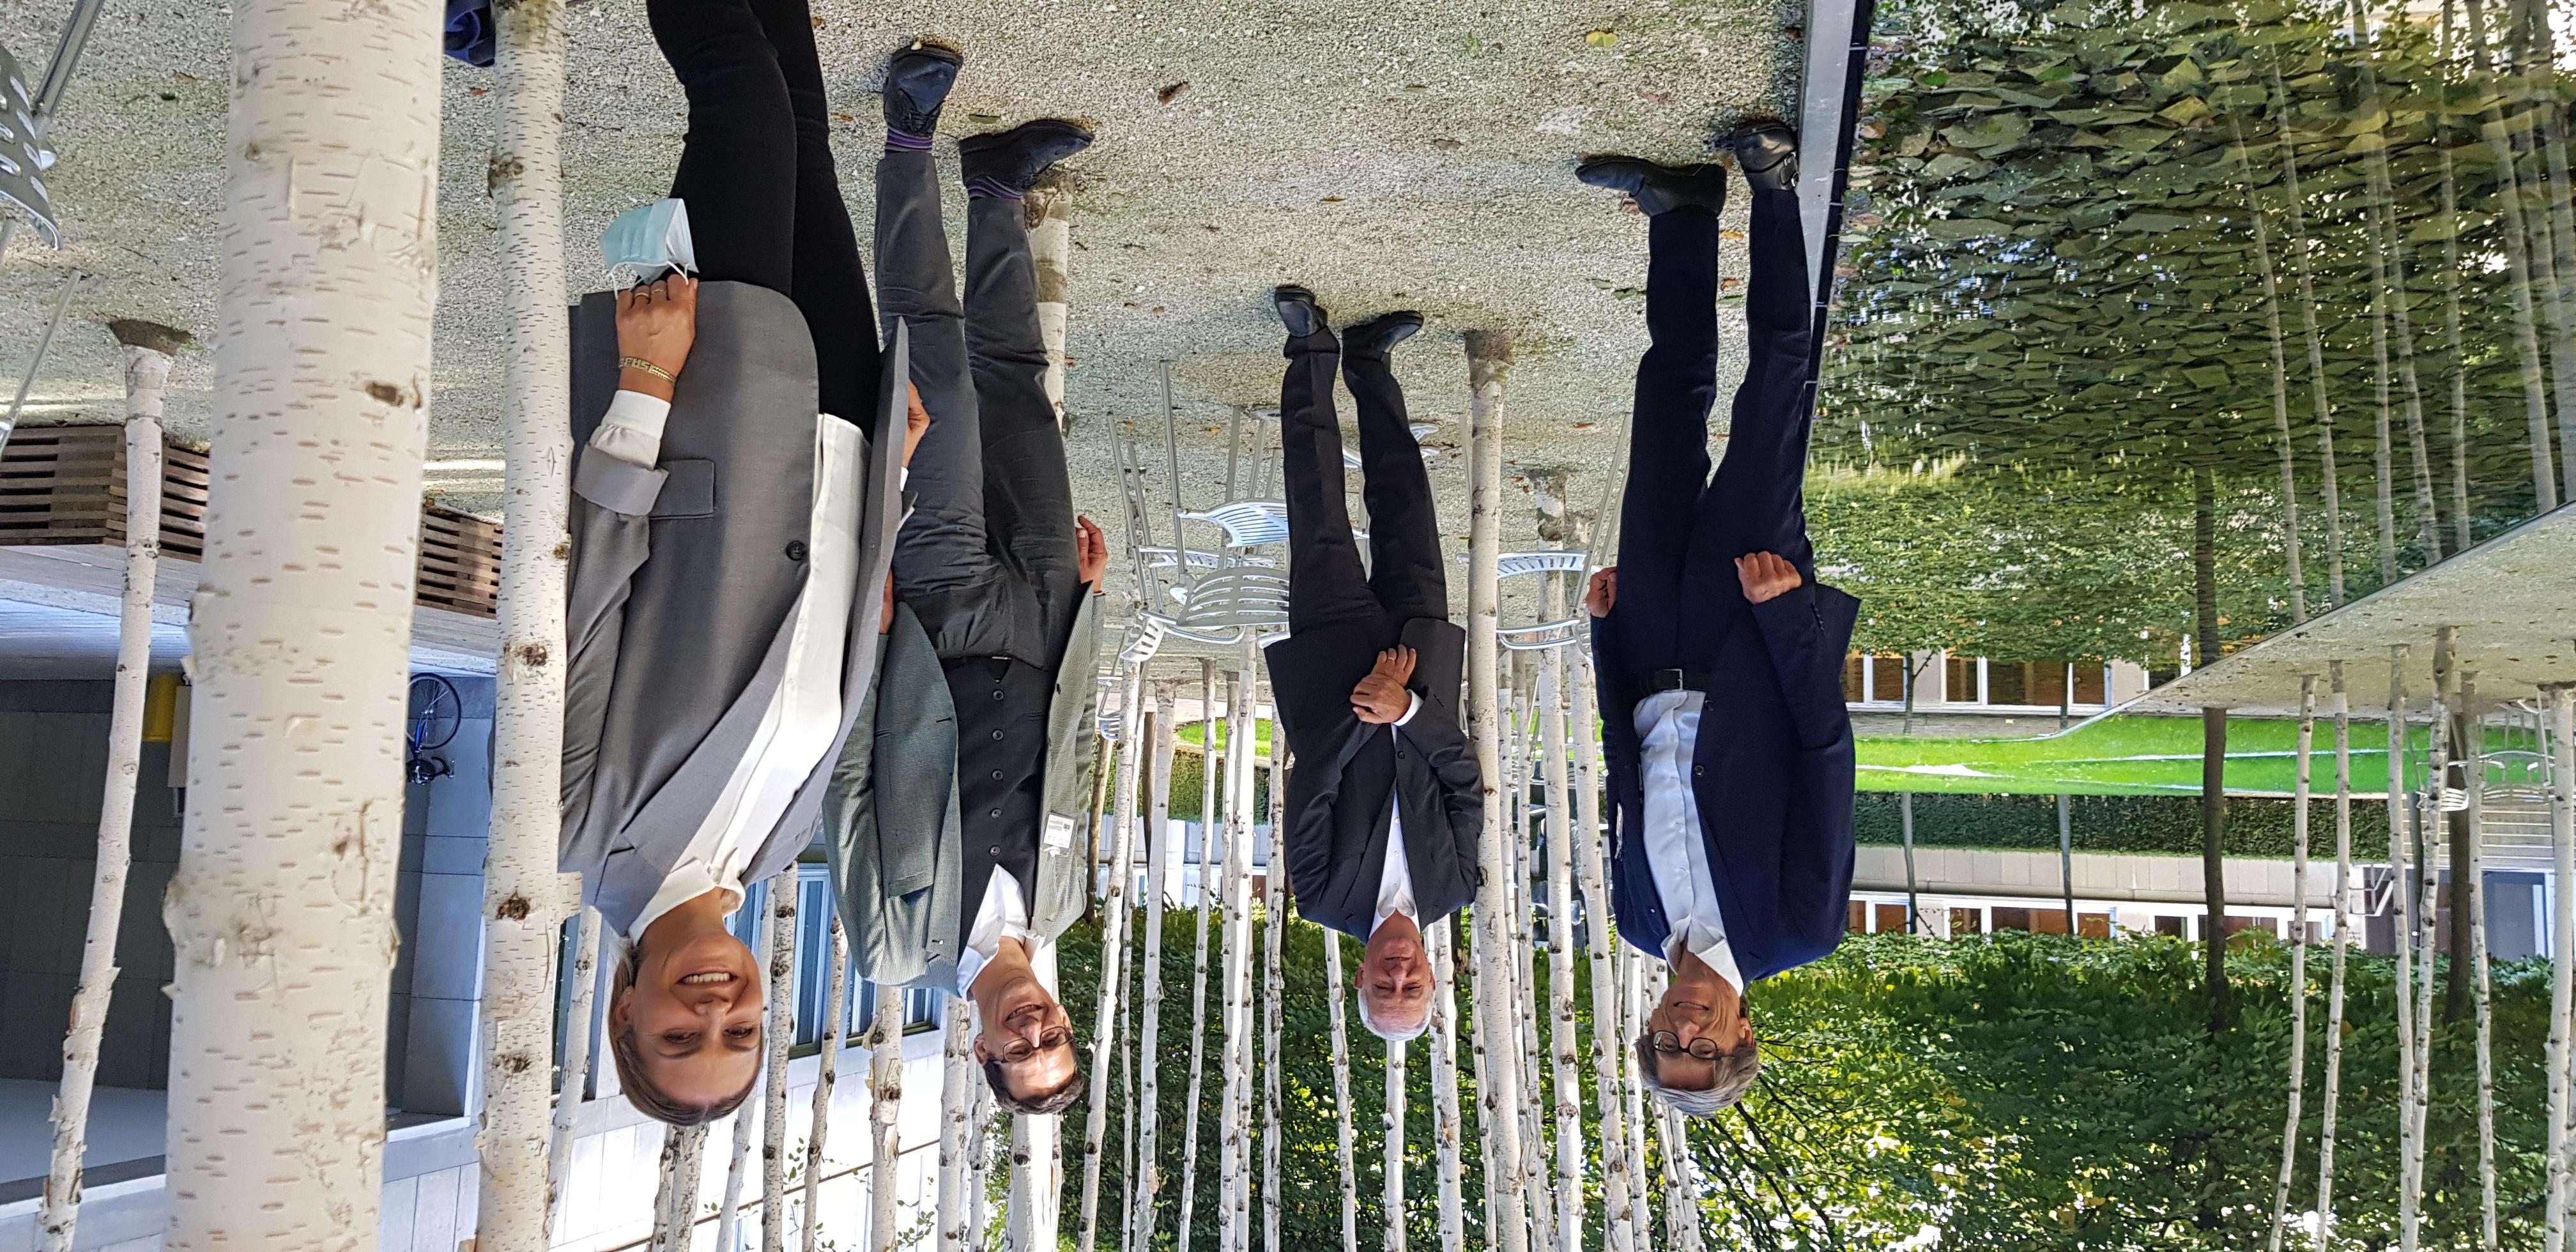 Partnermeeting in Pandemiezeiten auf dem Novartis Campus mit Thomas Heiniger (Präsident SRK), Jörg Reinhardt (Präsident Novartis), Markus Mader (Direktor SRK) und Isabel Dalli (Leiterin Sponsoring & Donations Novartis). Copyright: SRK, Dorothea Bergler